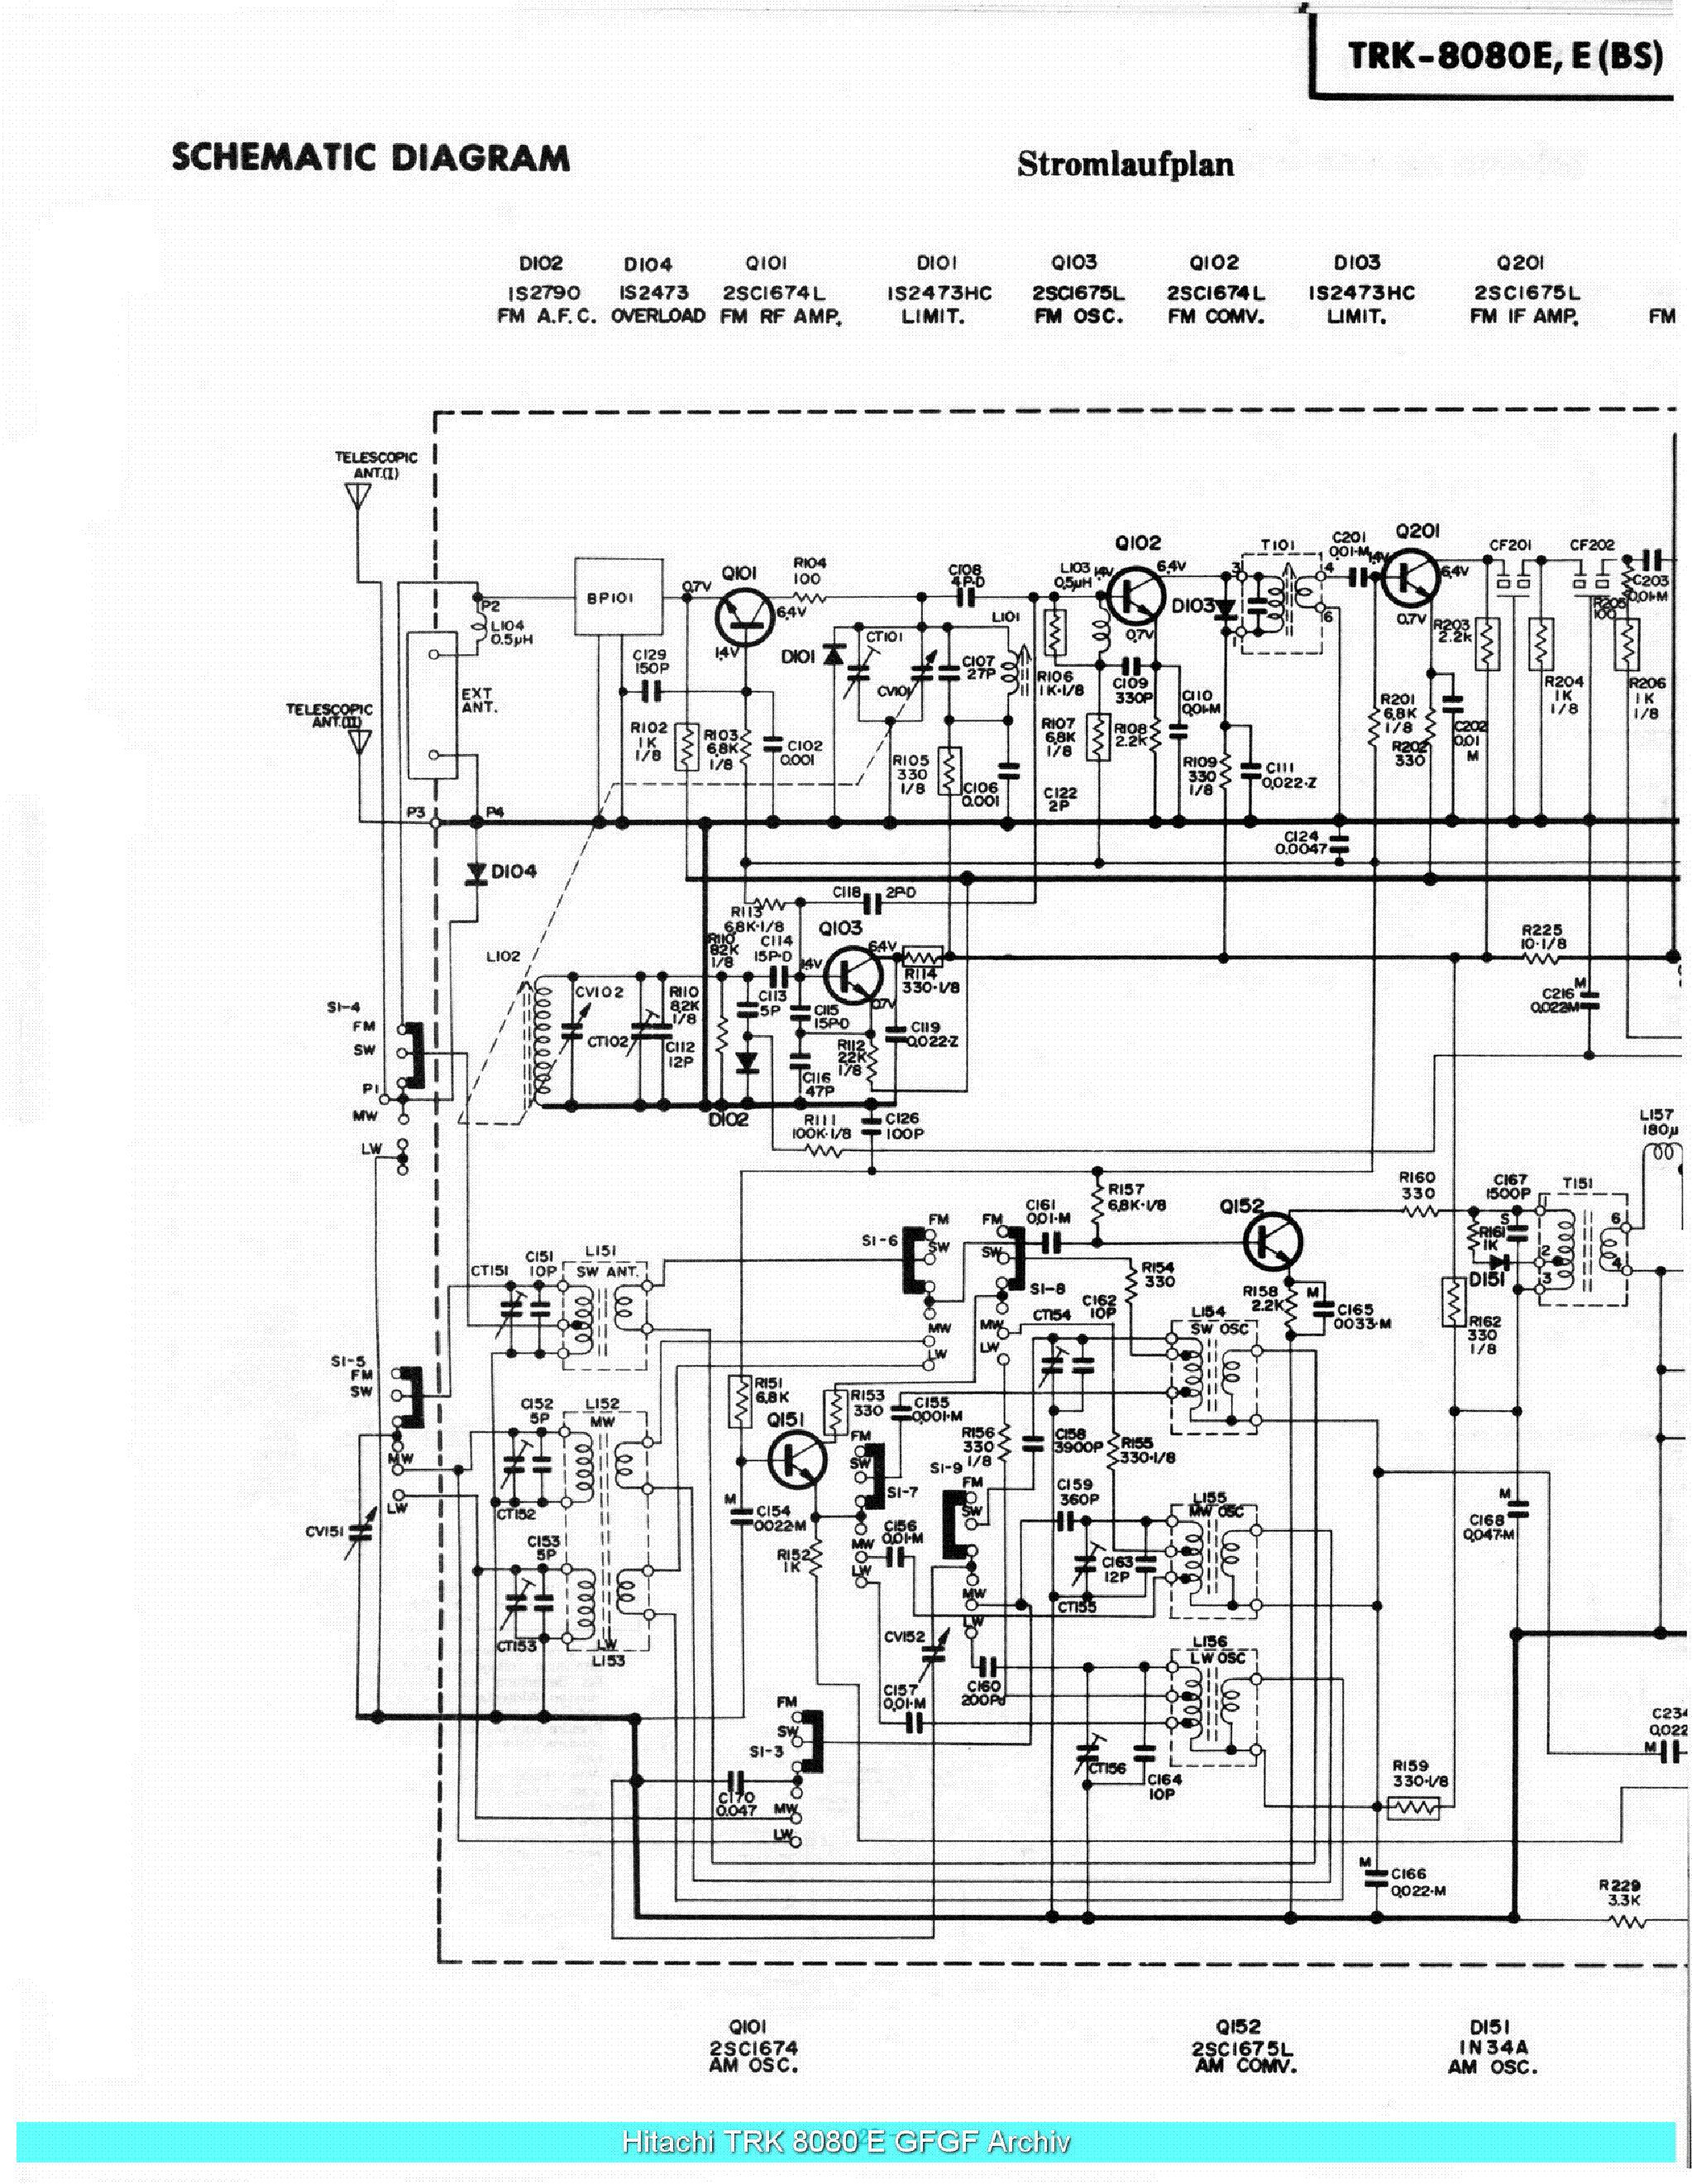 HITACHI TRK-8080E SCHEMATIC Service Manual download